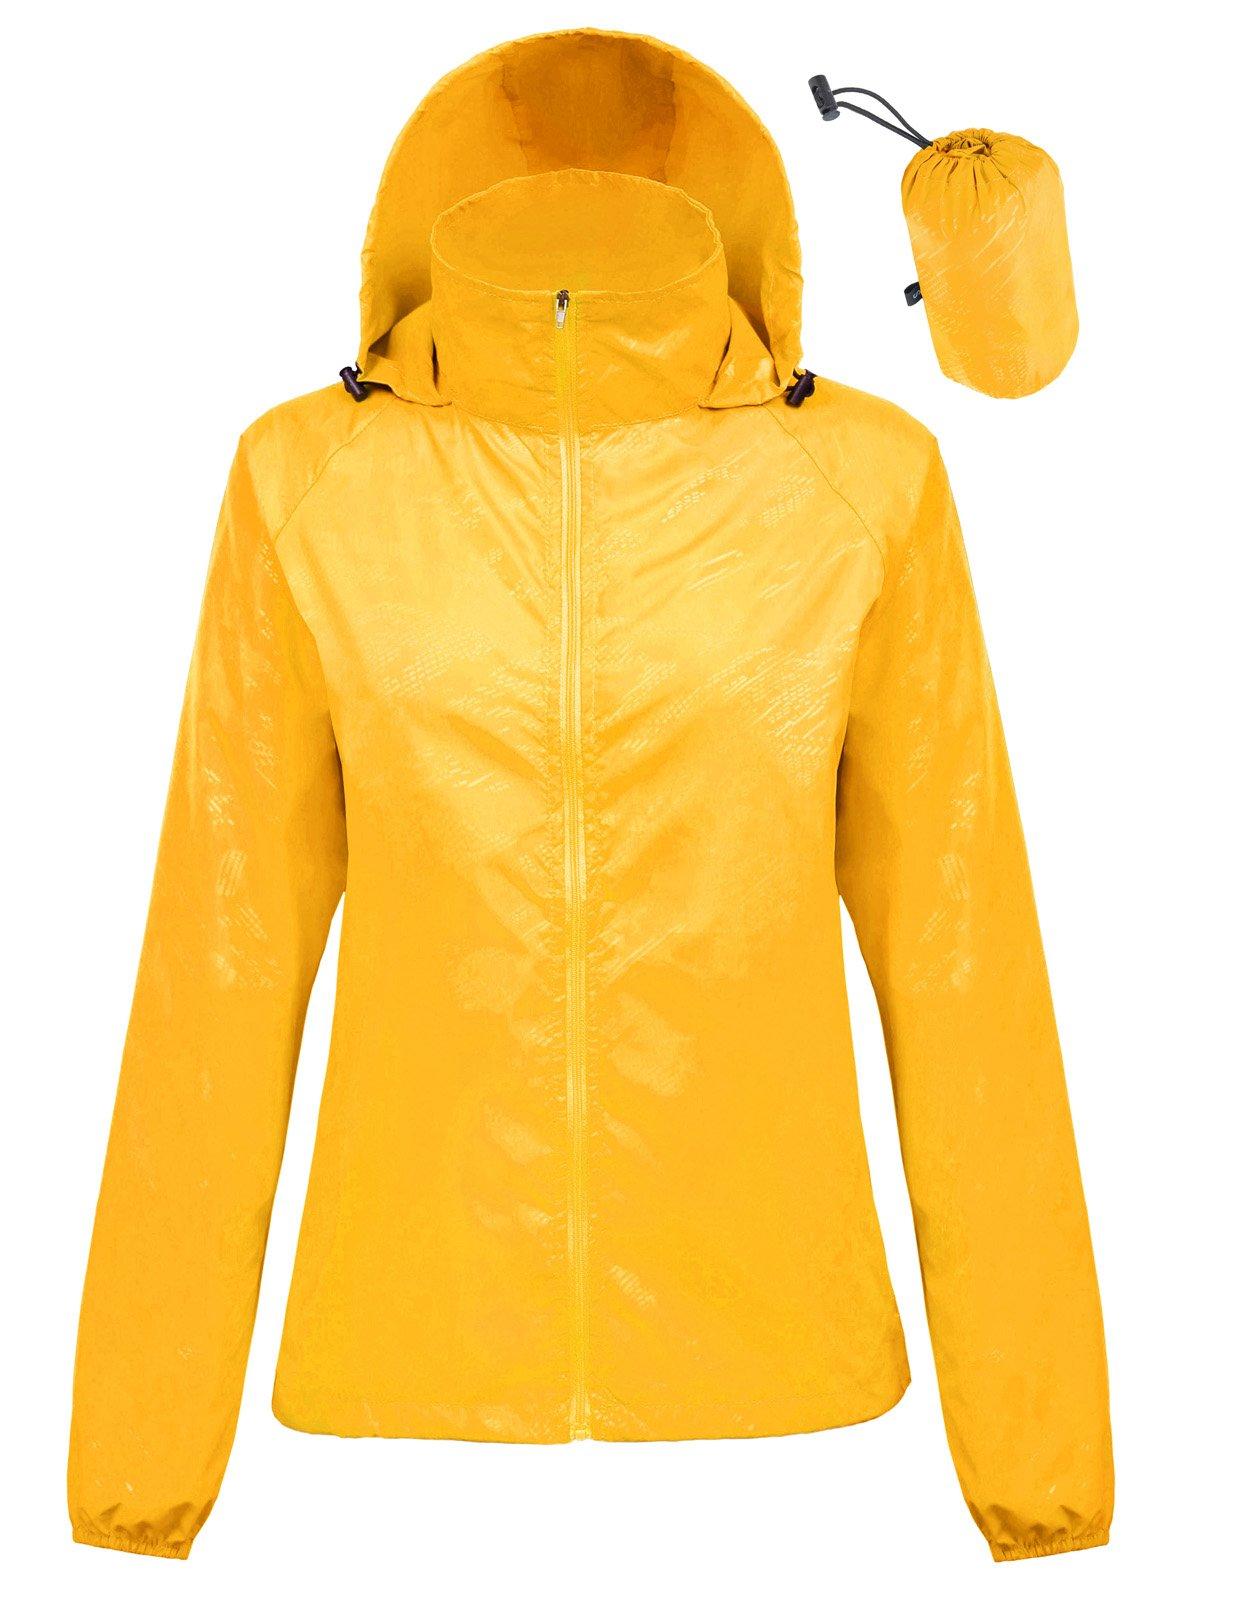 Kate Kasin Mountaineer Travel Windproof Jackets Rain Coats for Women (M,Yellow1001)